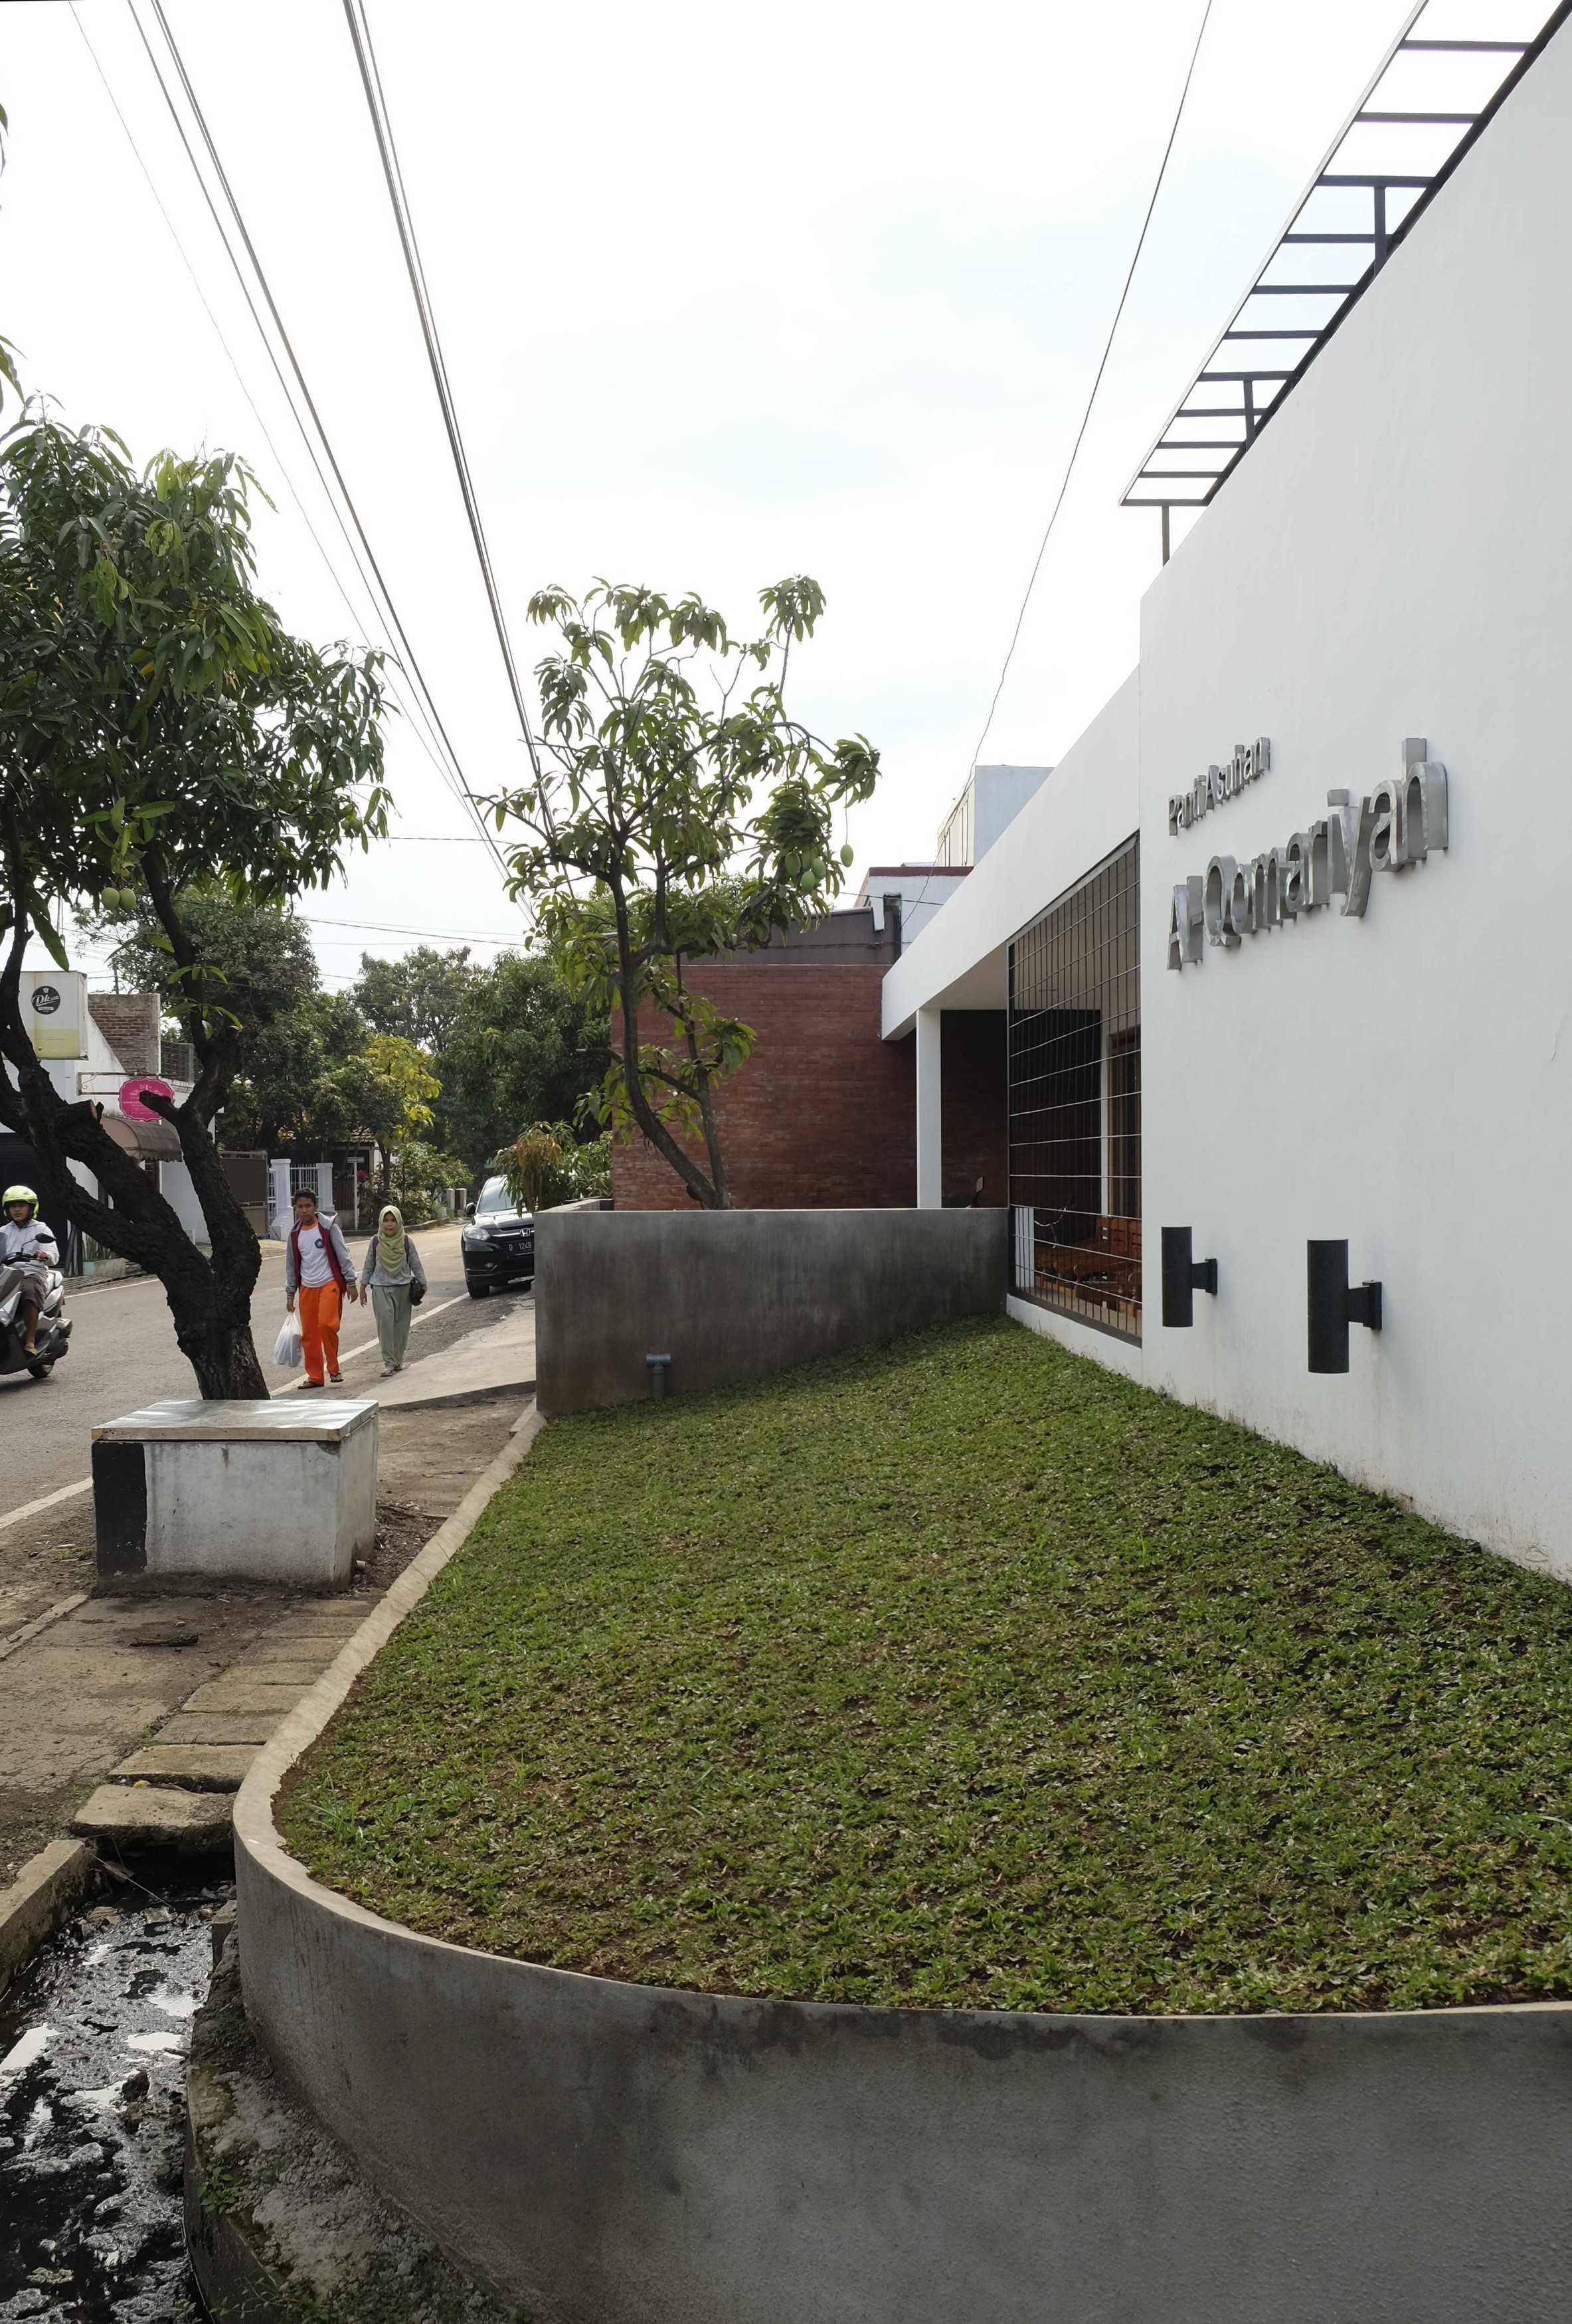 Eki Achmad Rujai Al-Qomariyah Orphanage Bandung, Kota Bandung, Jawa Barat, Indonesia Bandung, Kota Bandung, Jawa Barat, Indonesia Eki-Achmad-Rujai-Al-Qomariyah-Orphanage   66667